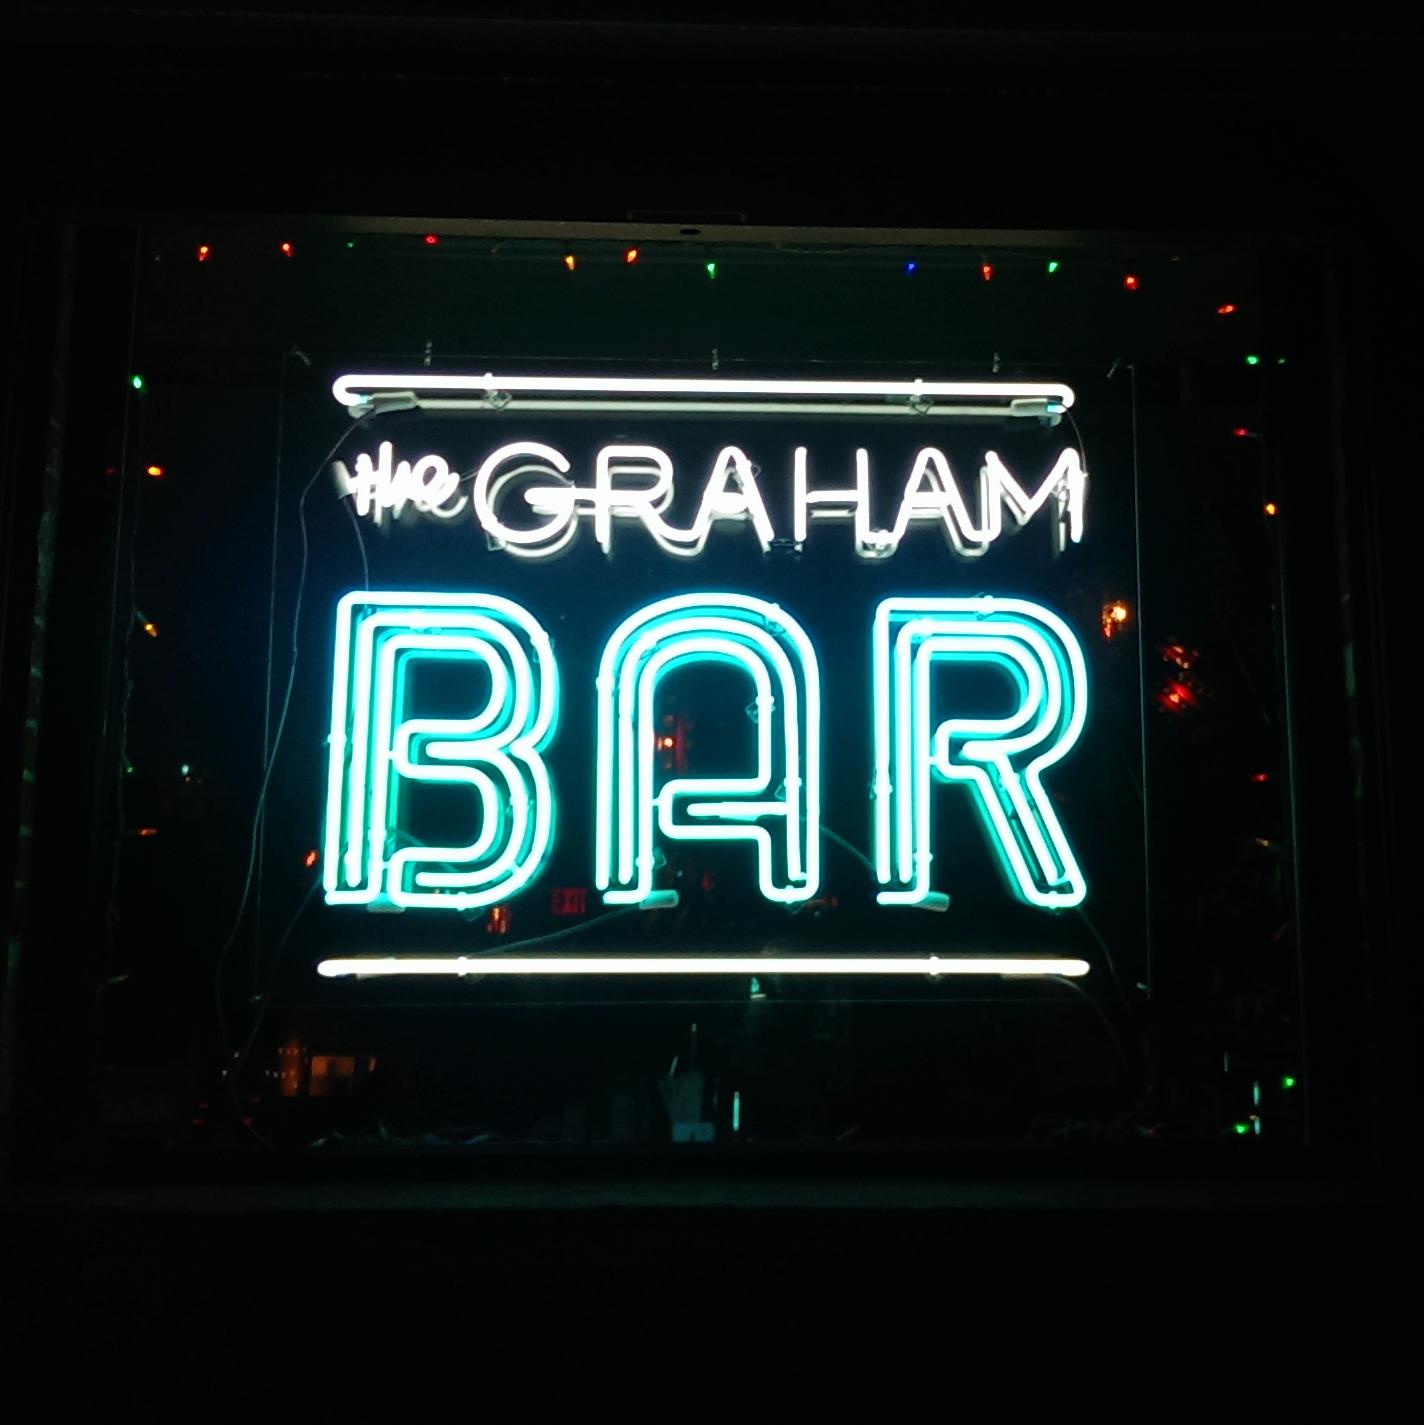 The Graham